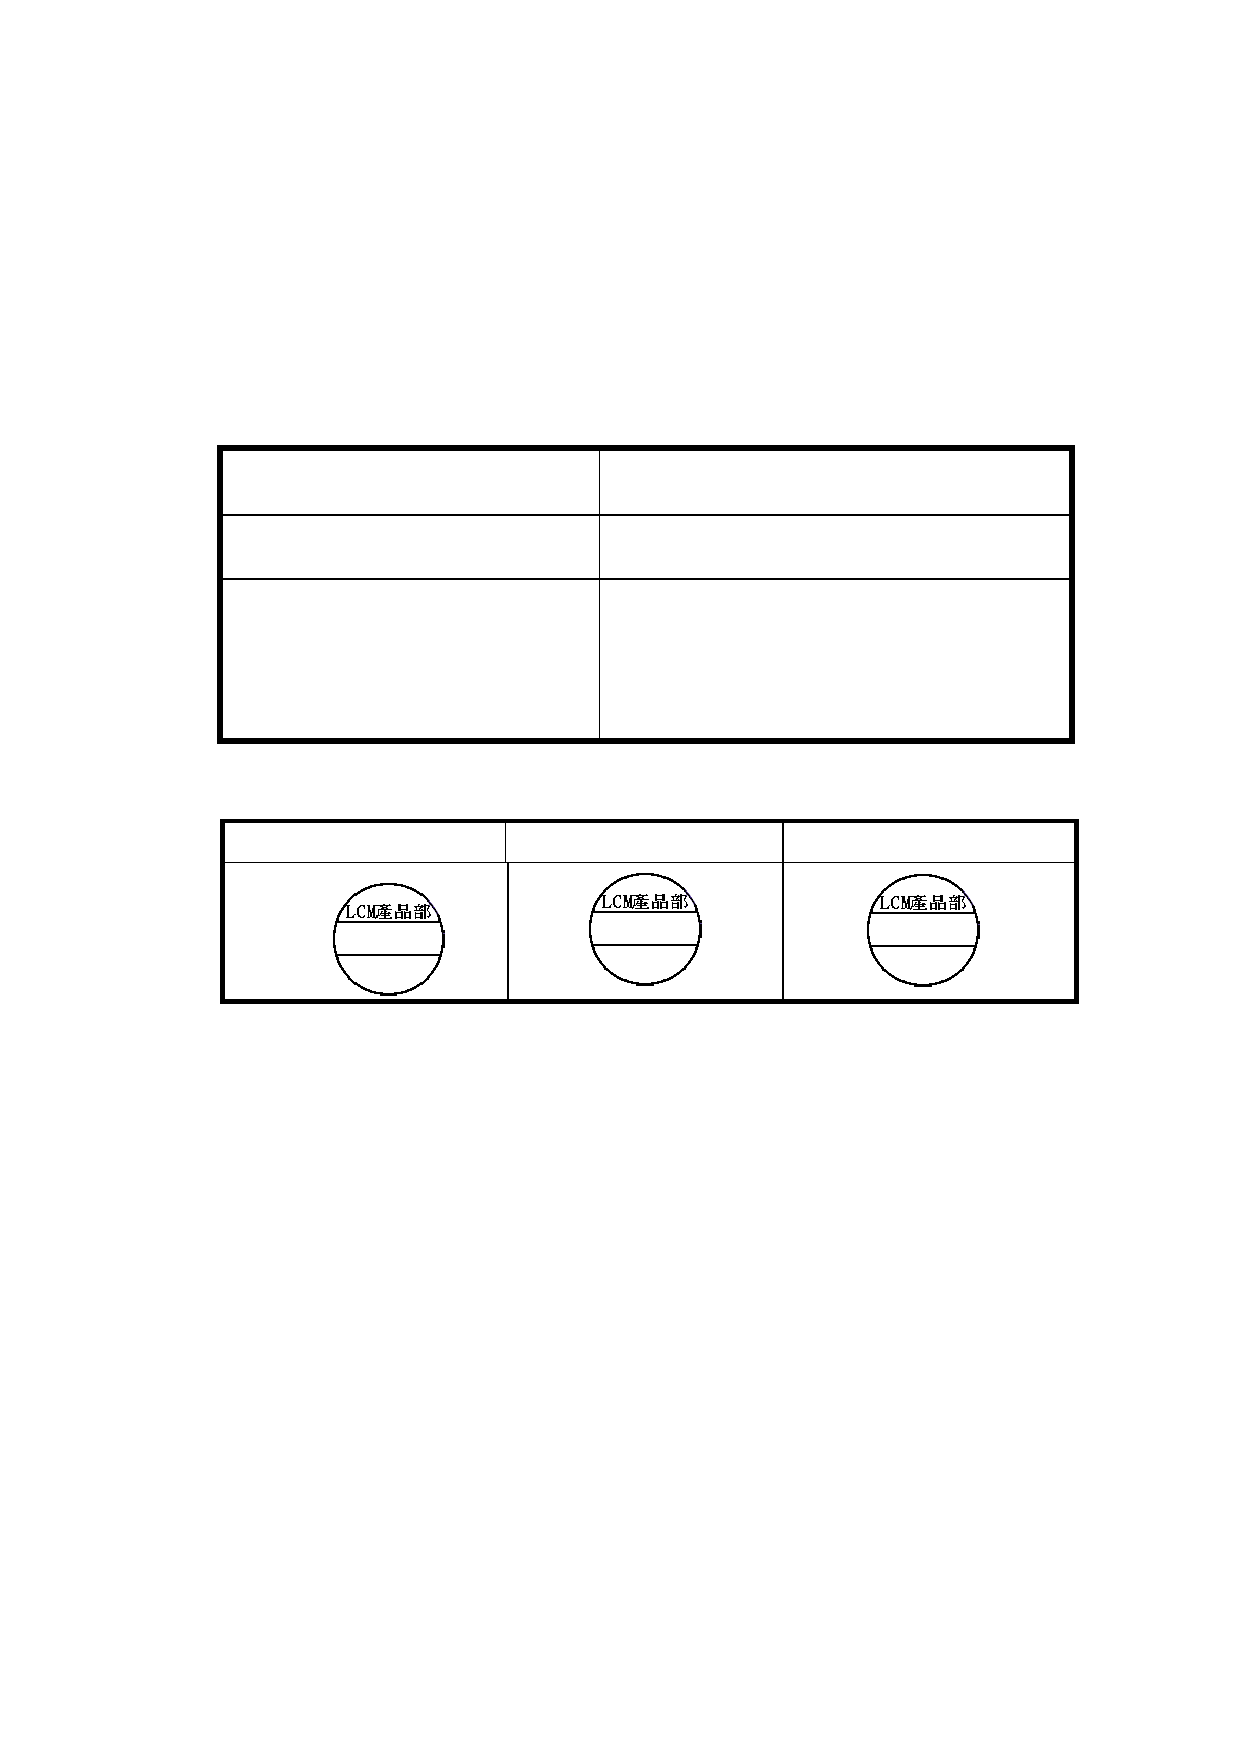 I1101-6TJN0906C datasheet